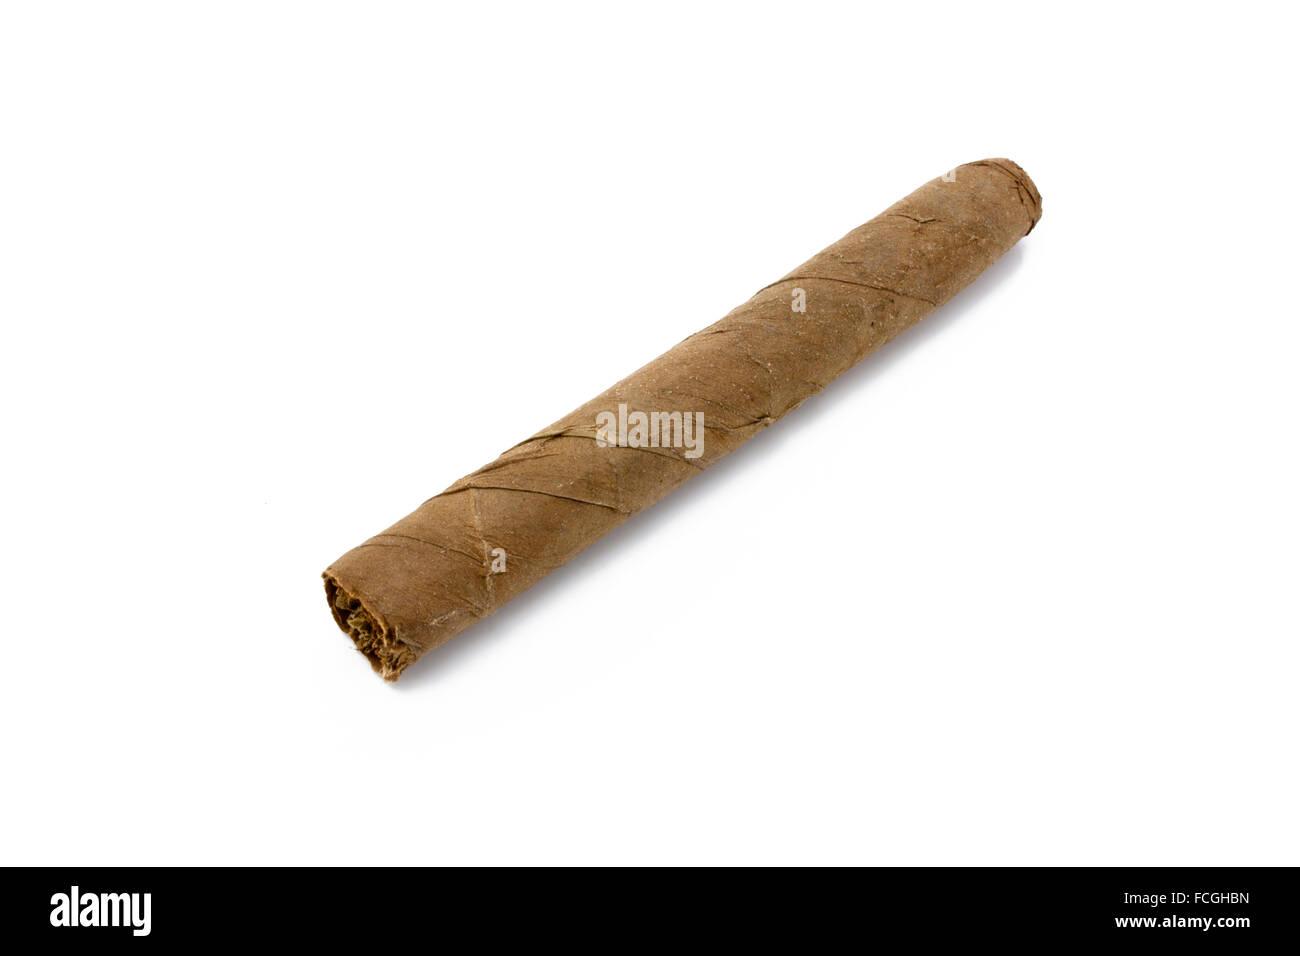 Cuban cigar isolated on white - Stock Image